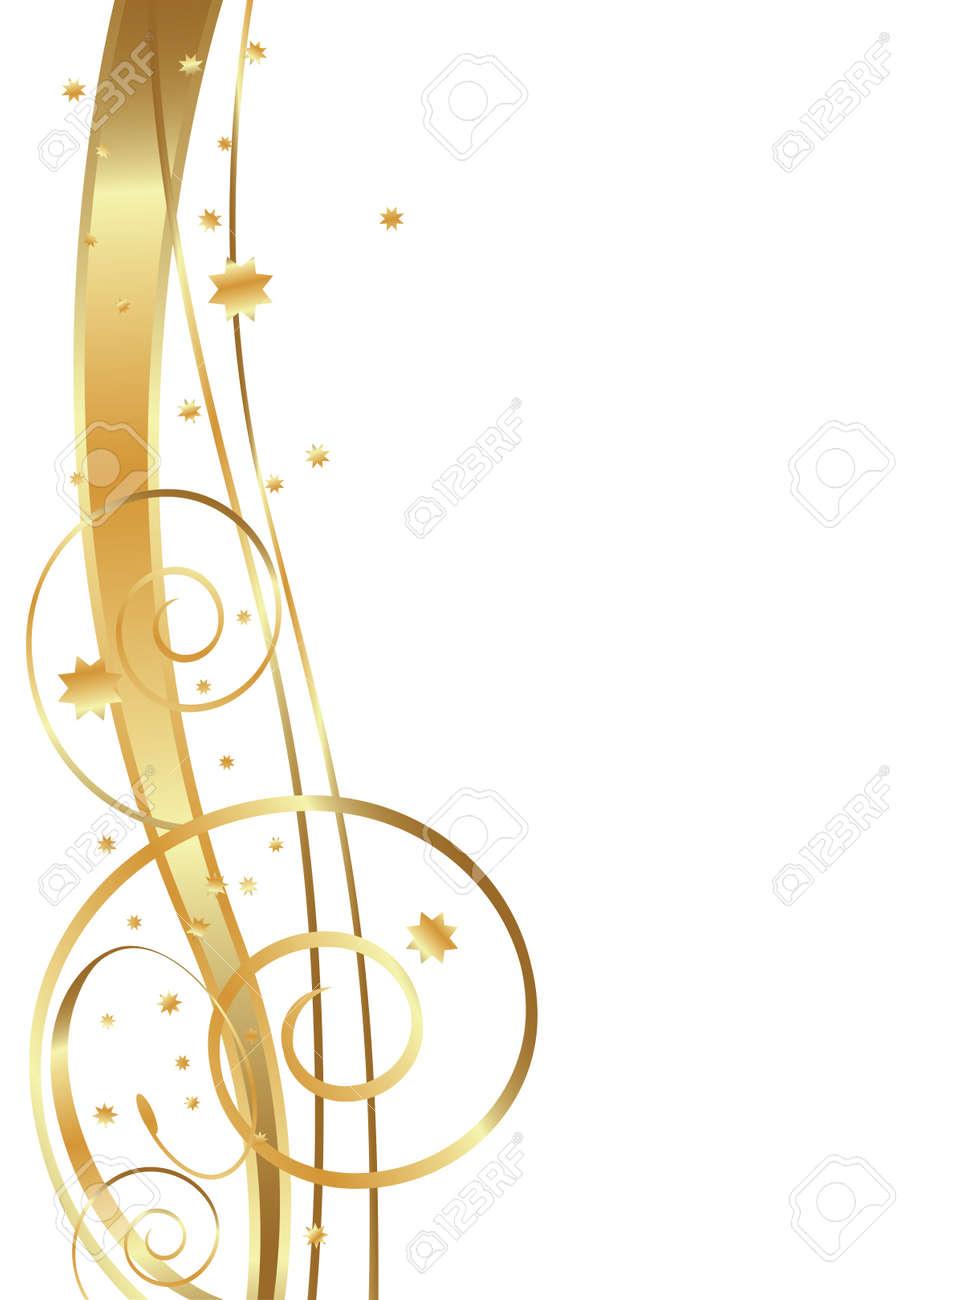 Gold Flowing Background, swirls, twirls and stars - 59696759